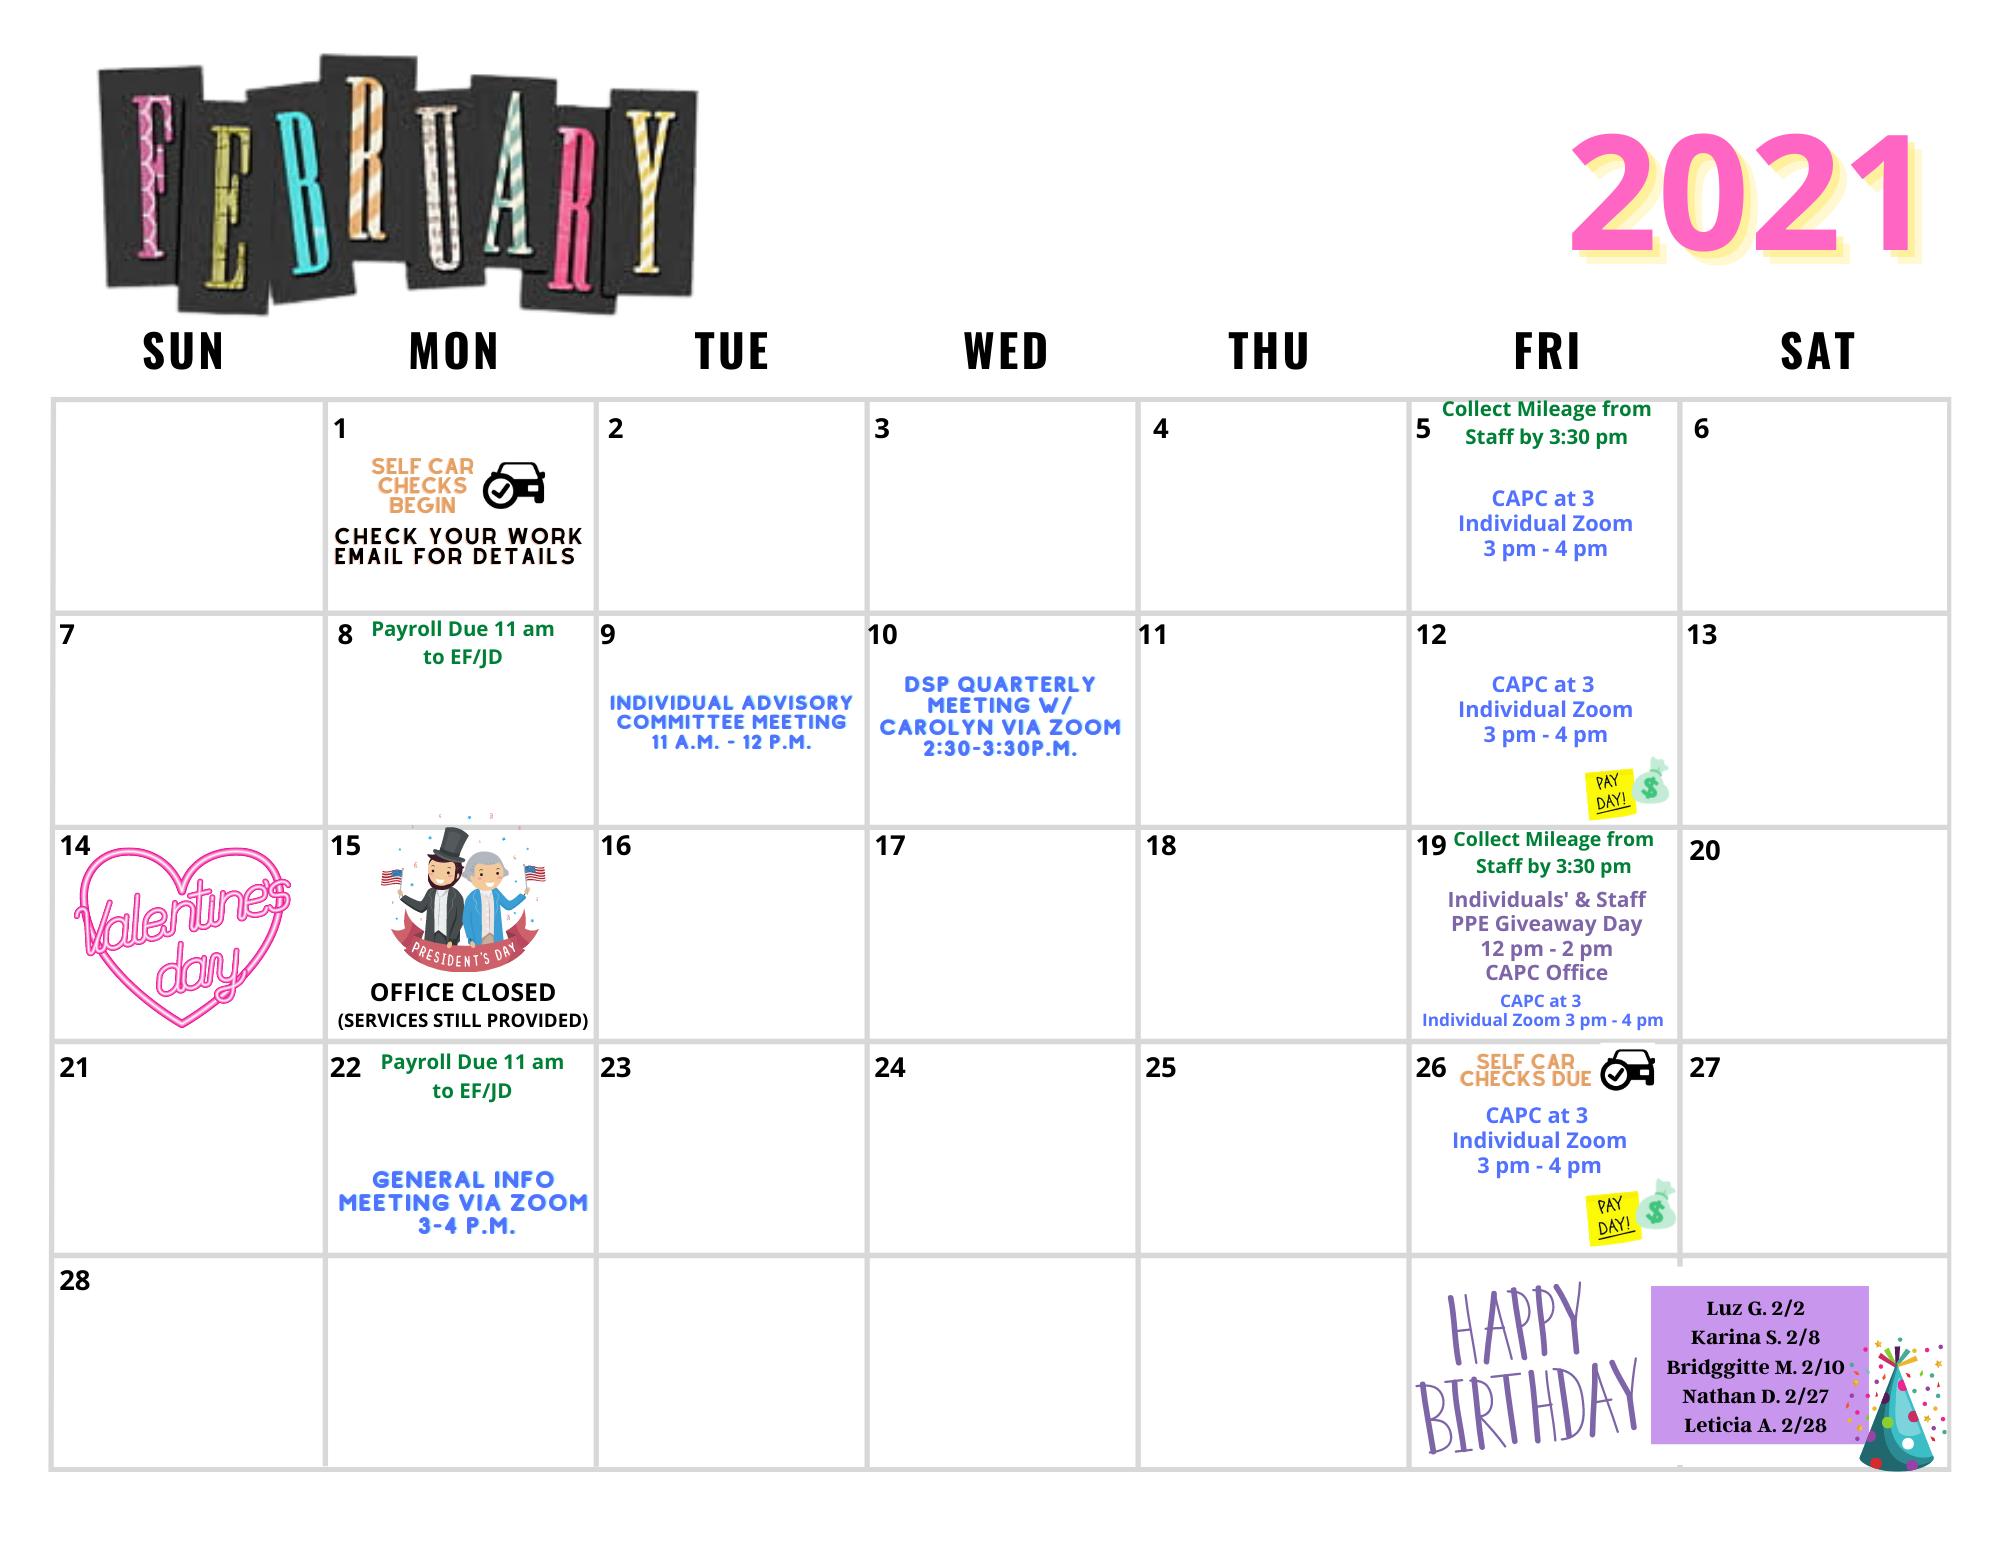 Staff Calendar_02.21